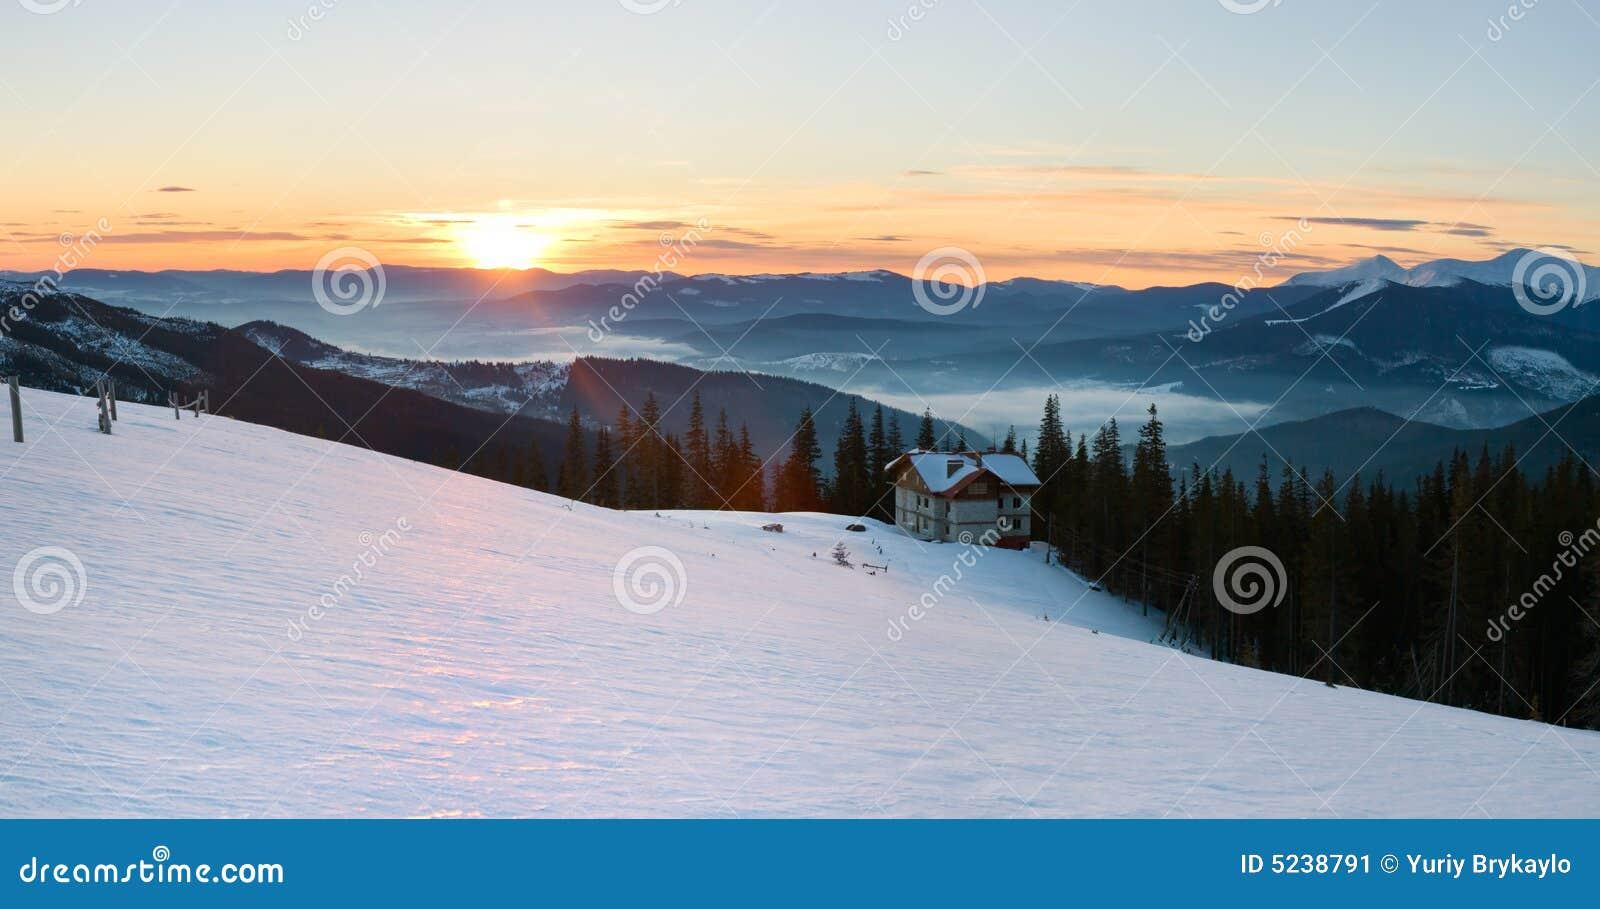 sunrise mountain panorama stock image. image of footprint - 5238791